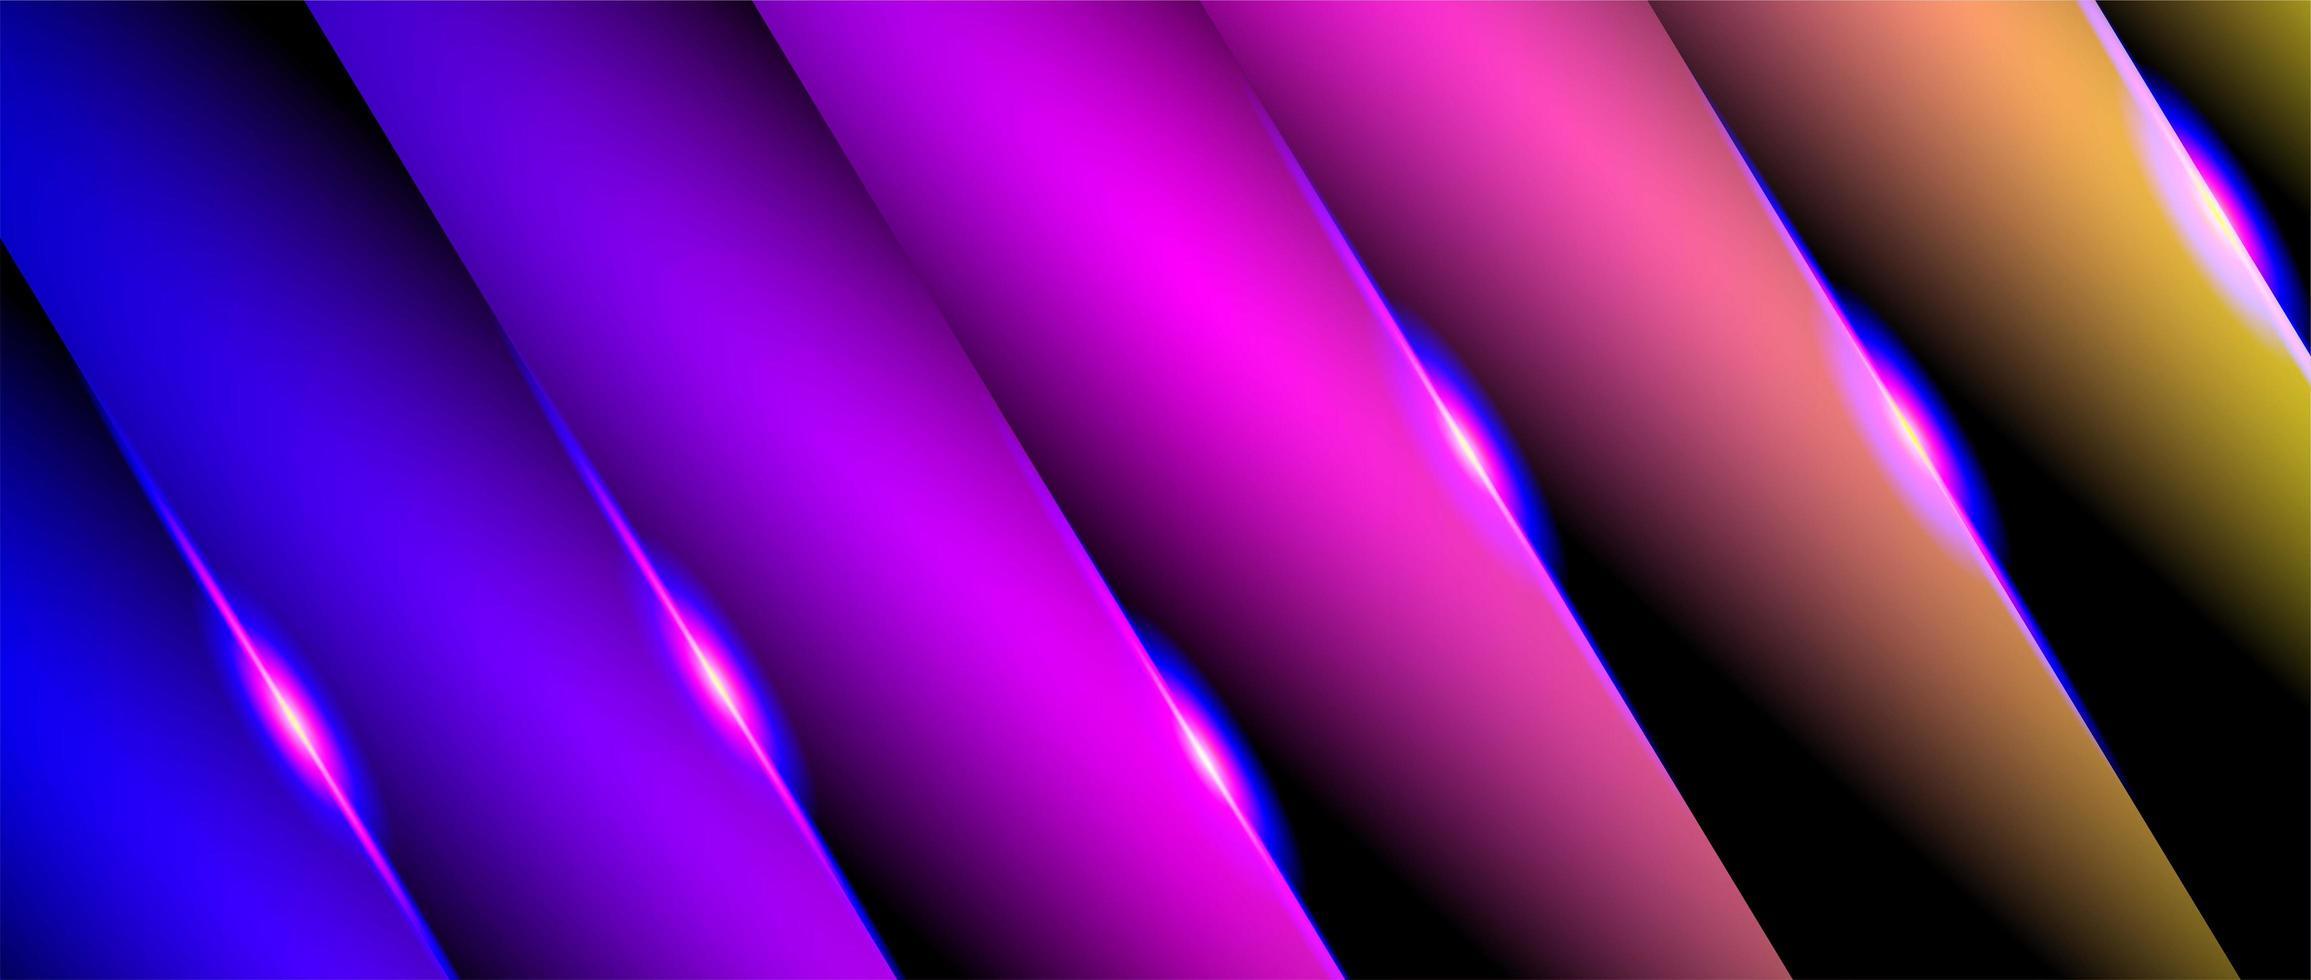 überlappende rosa, gelbe, blaue Farbverläufe glänzende diagonale Papierformen vektor